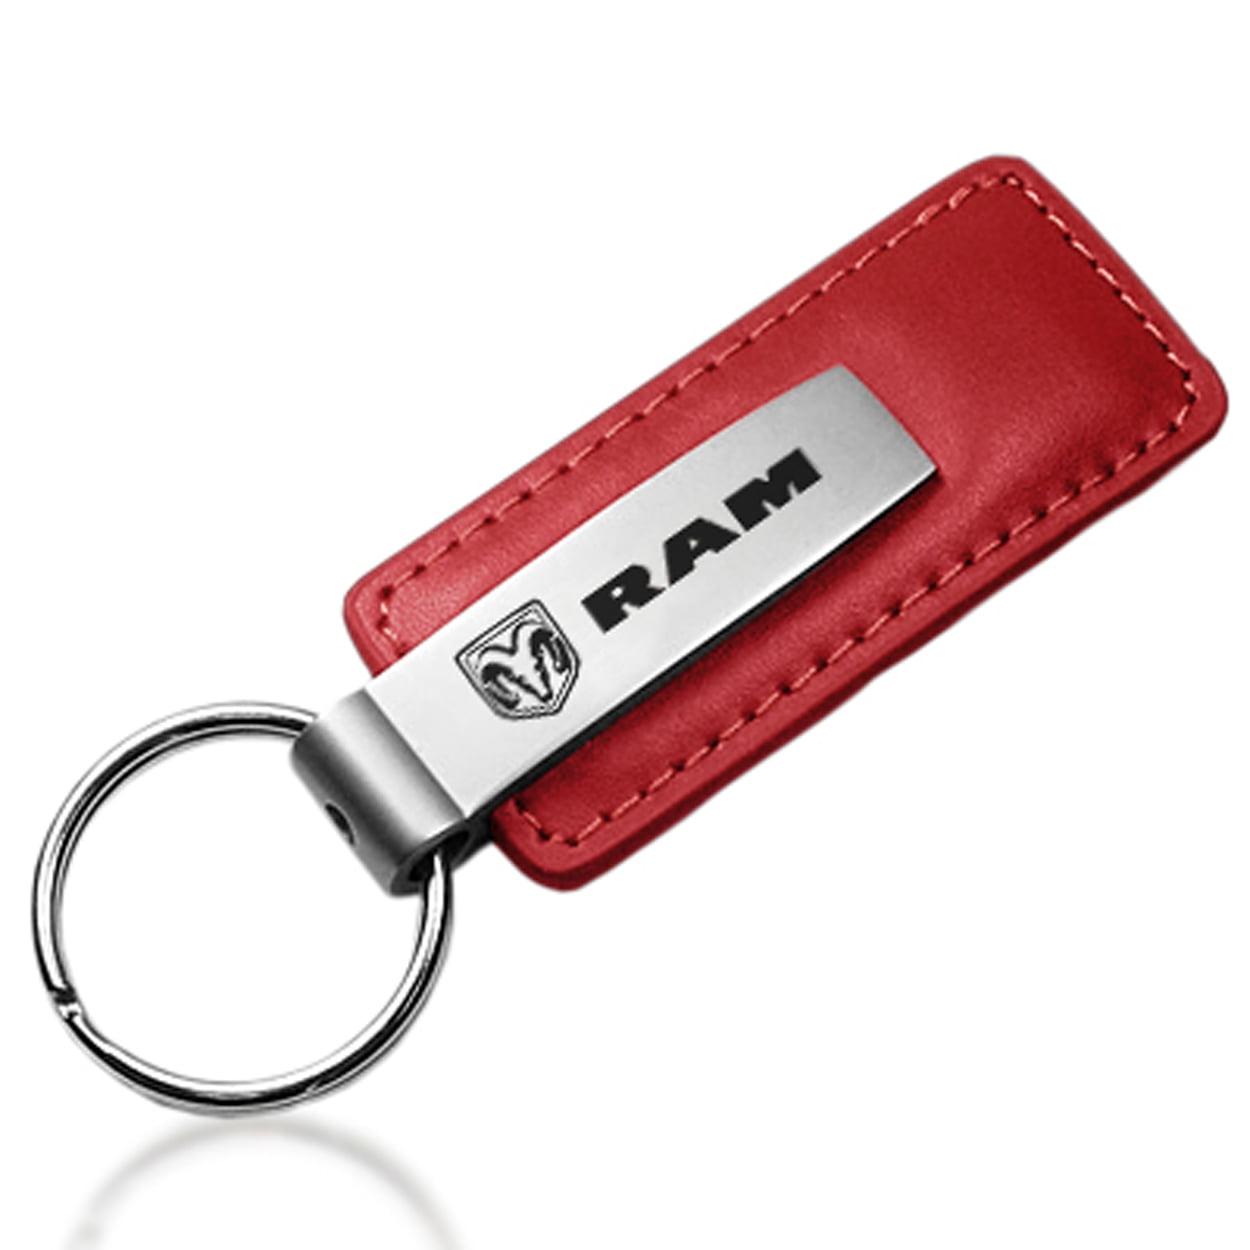 Dodge RAM Logo Red Leather Key Chain